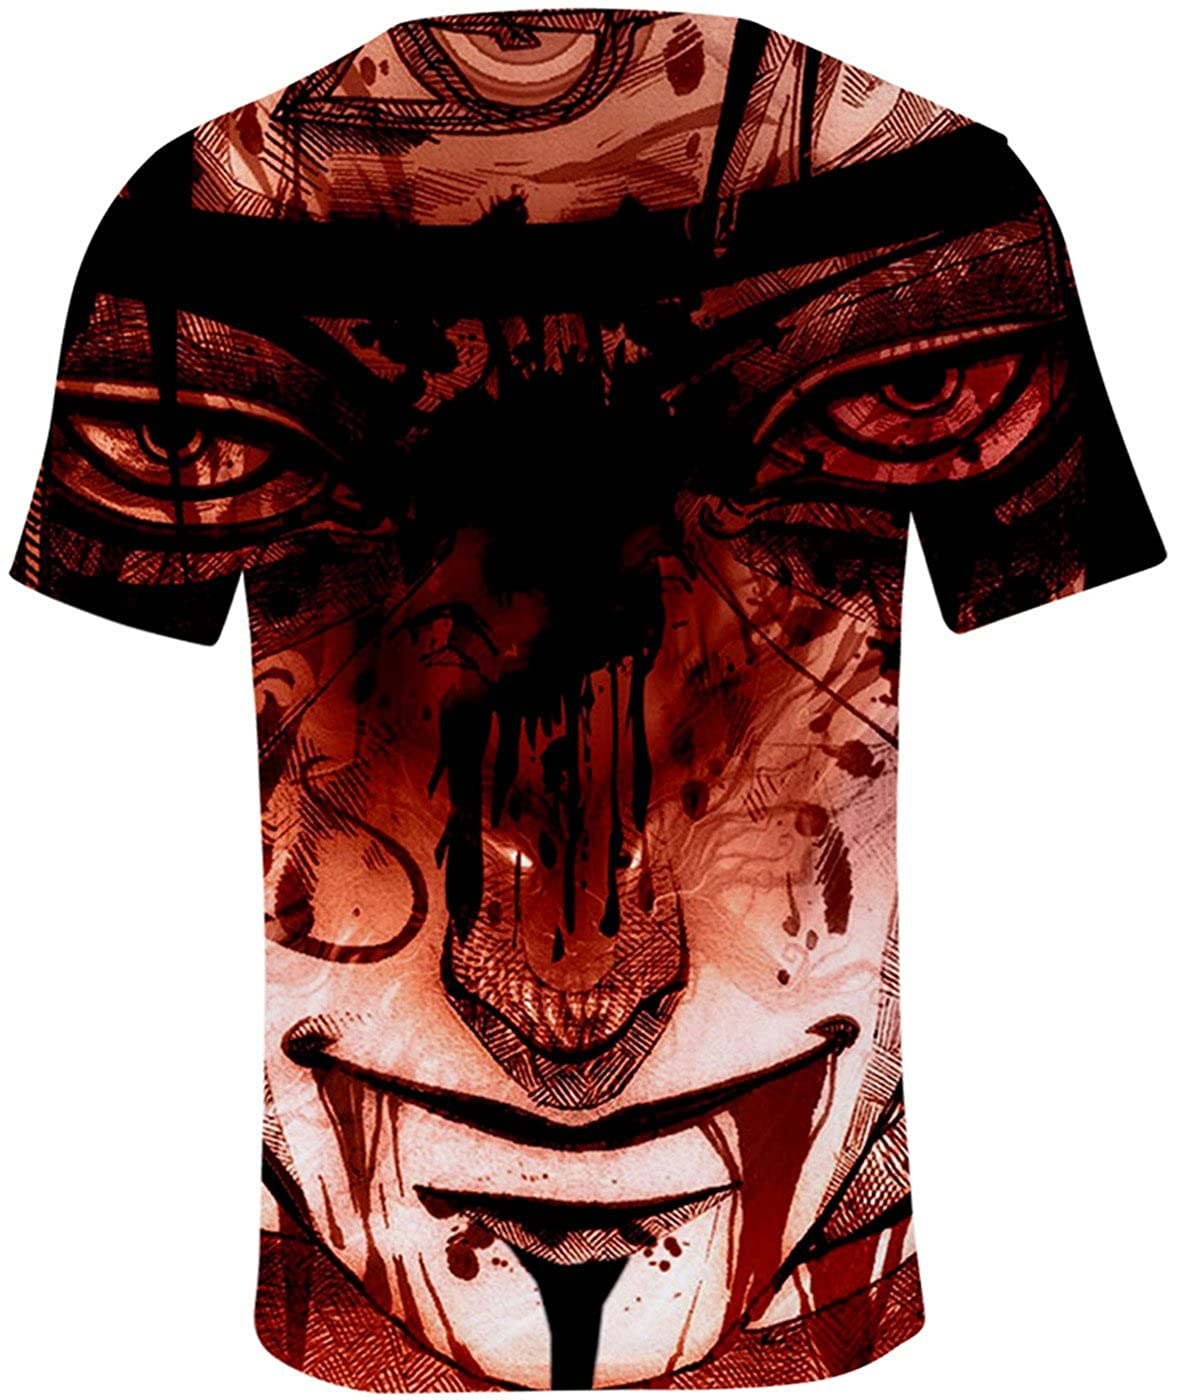 SERAPHY Unisexe T-Shirt Naruto Top d/ét/é Uchiha Syaringan Uzumaki Naruto Top Mode Hokage Ninjia Hatake Kakashi Shirt